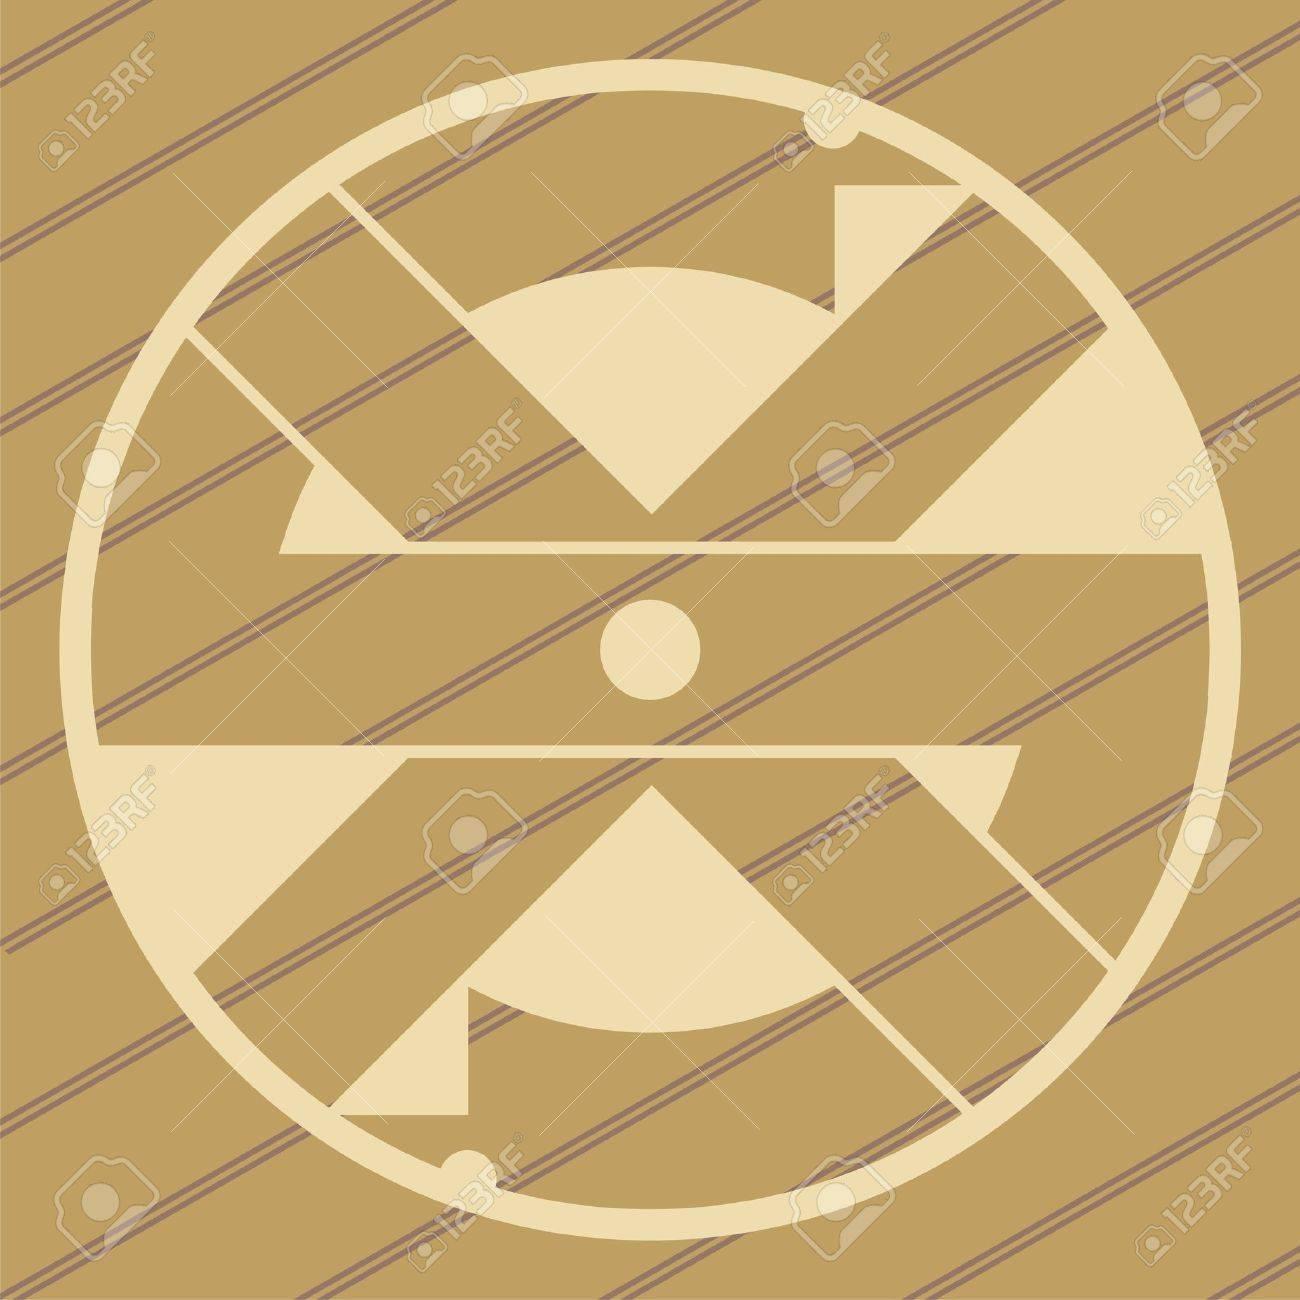 ufo crop circles design in wheat/corn fields Stock Vector - 9931346